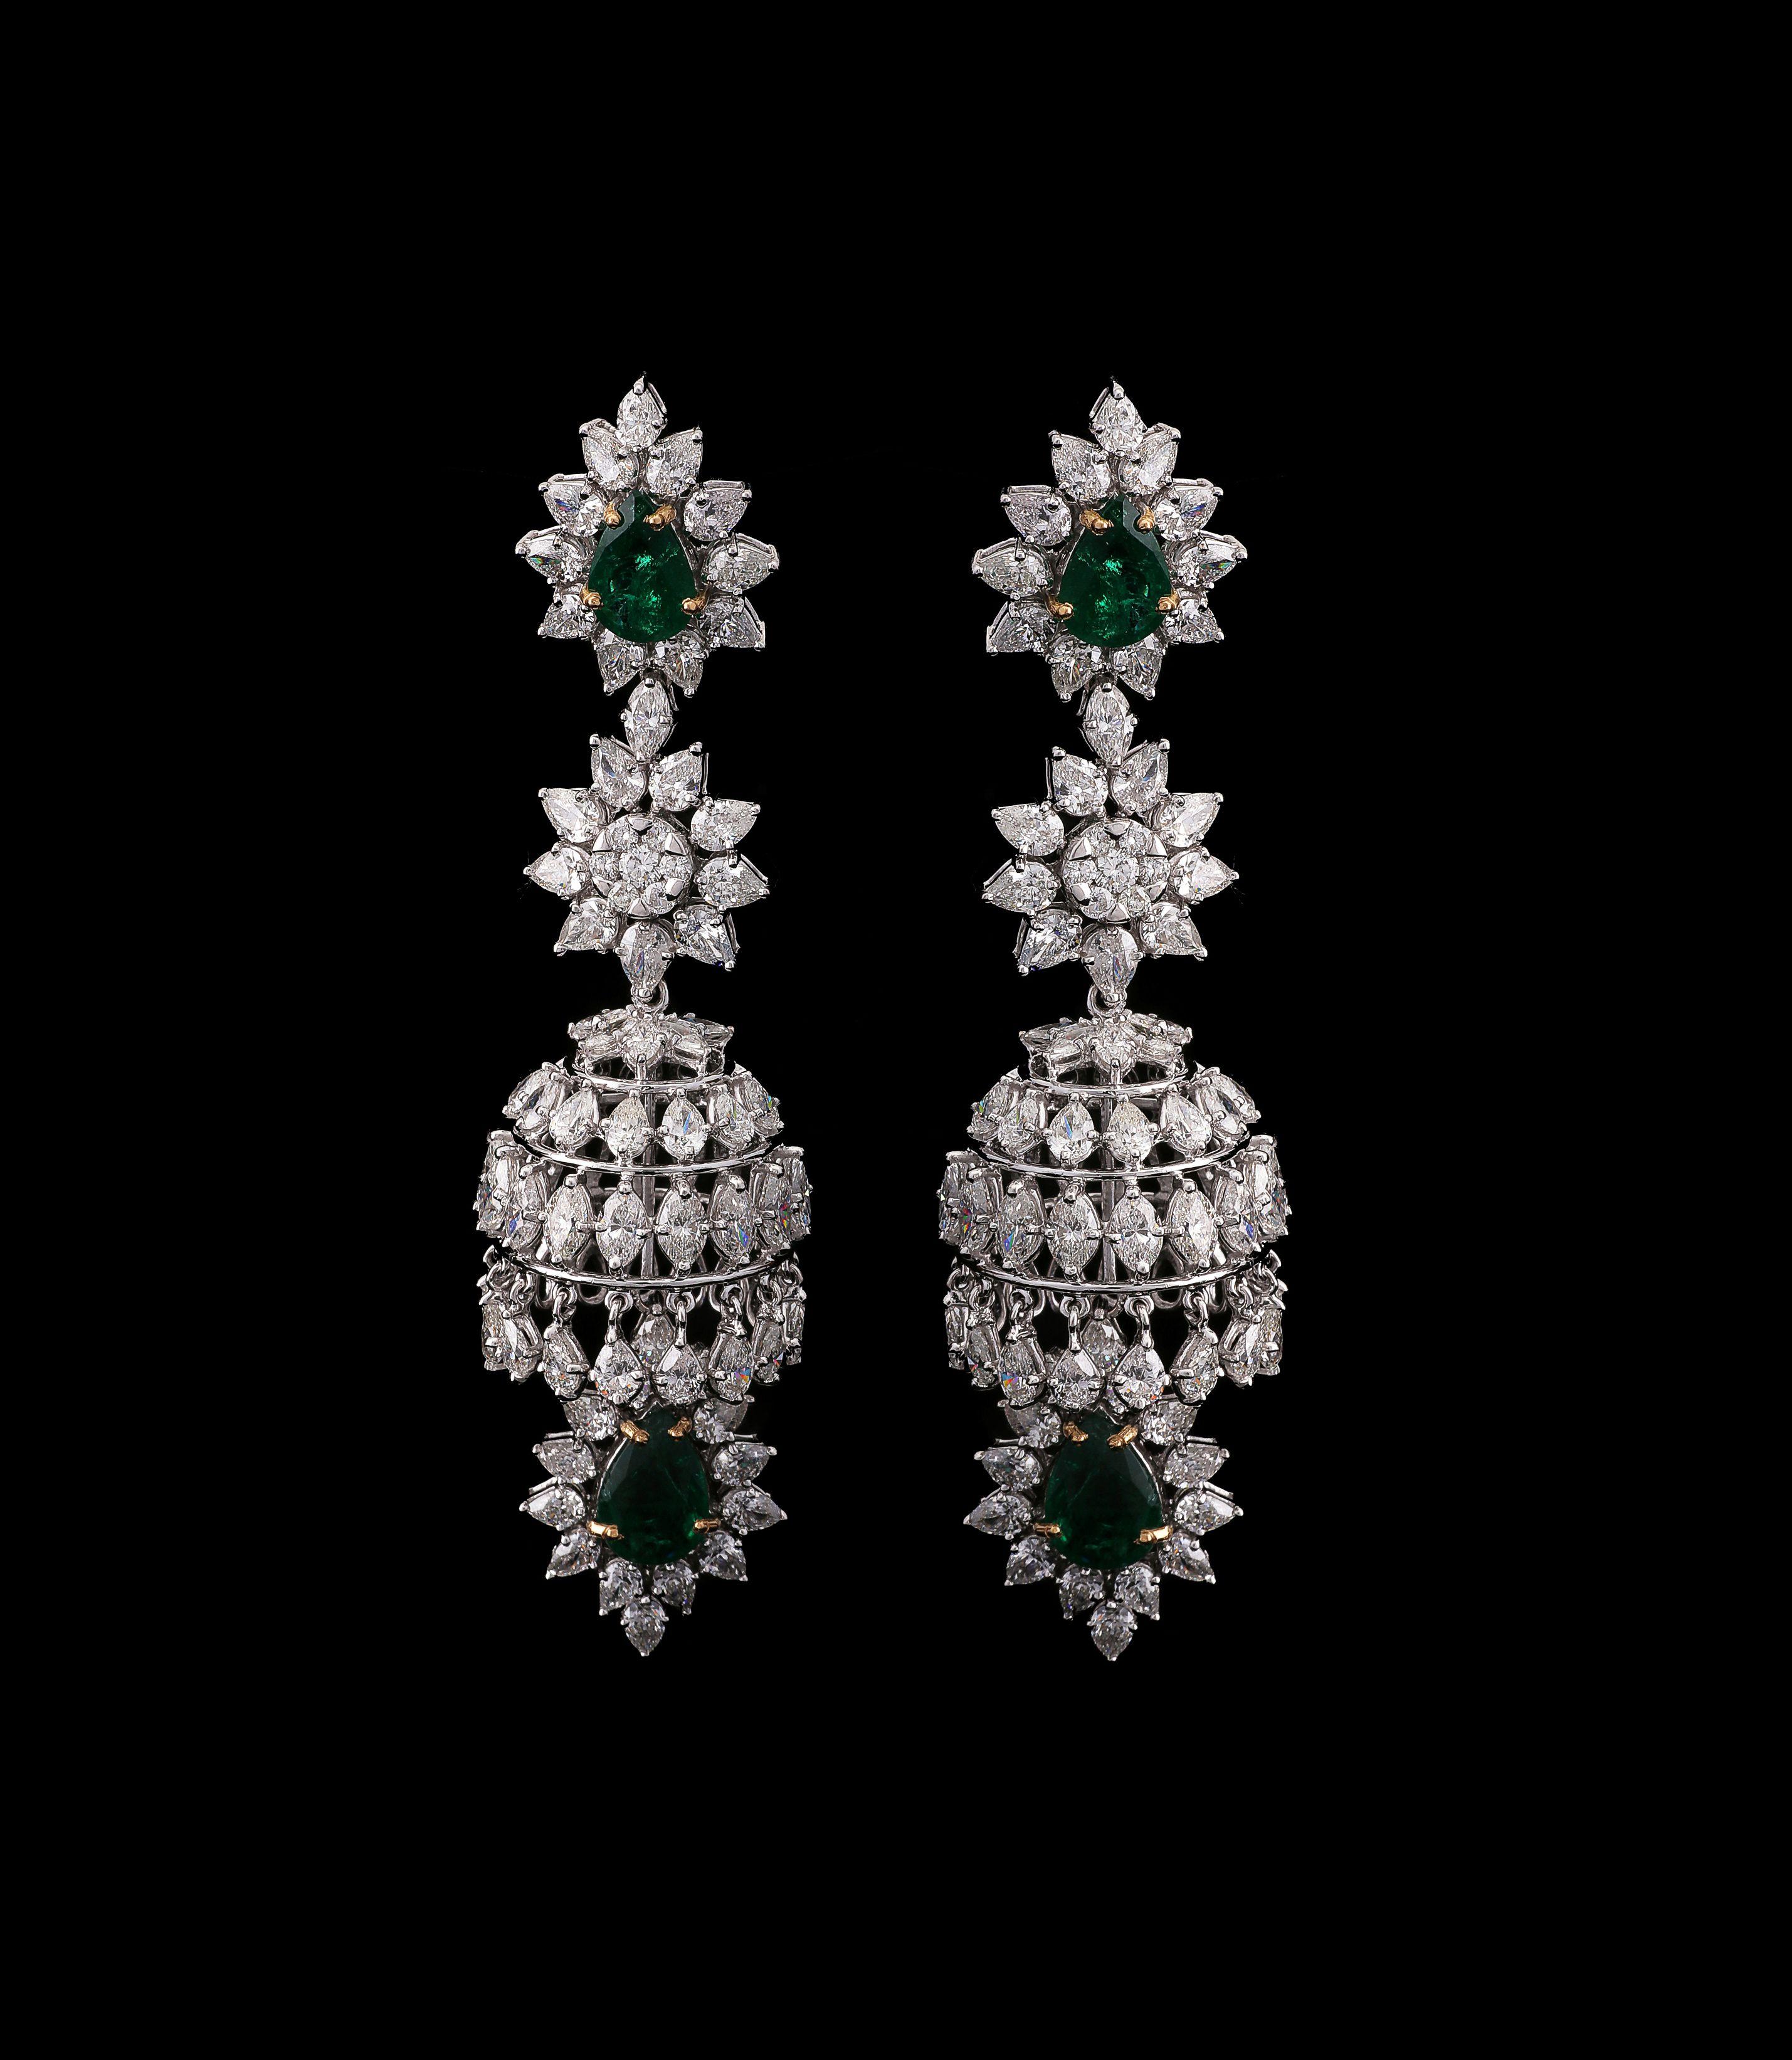 Chandelier Earrings - Sparkling diamonds emit radiant light | A ...